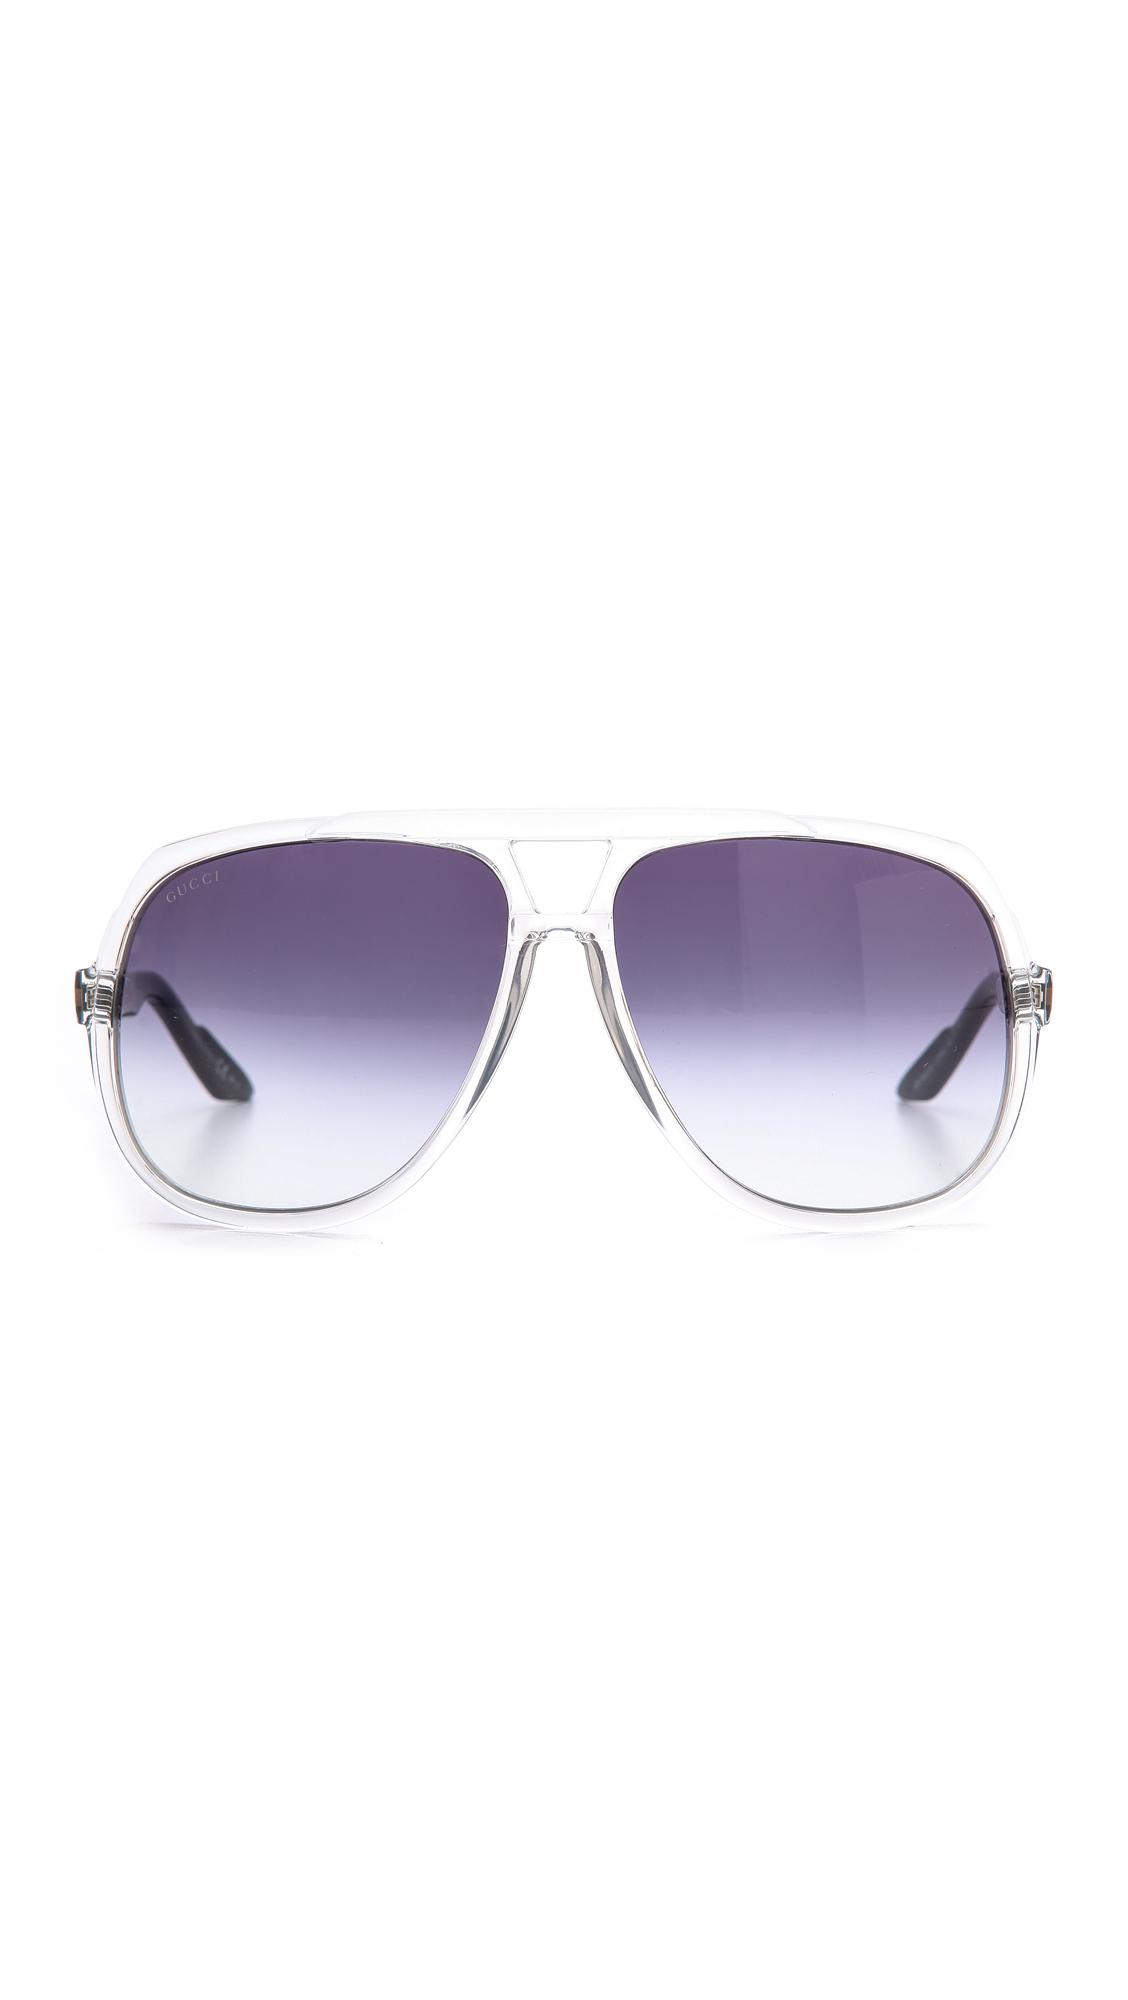 Oversized Mirrored Aviator Sunglasses  gucci mirrored oversized aviator sunglasses matte black black